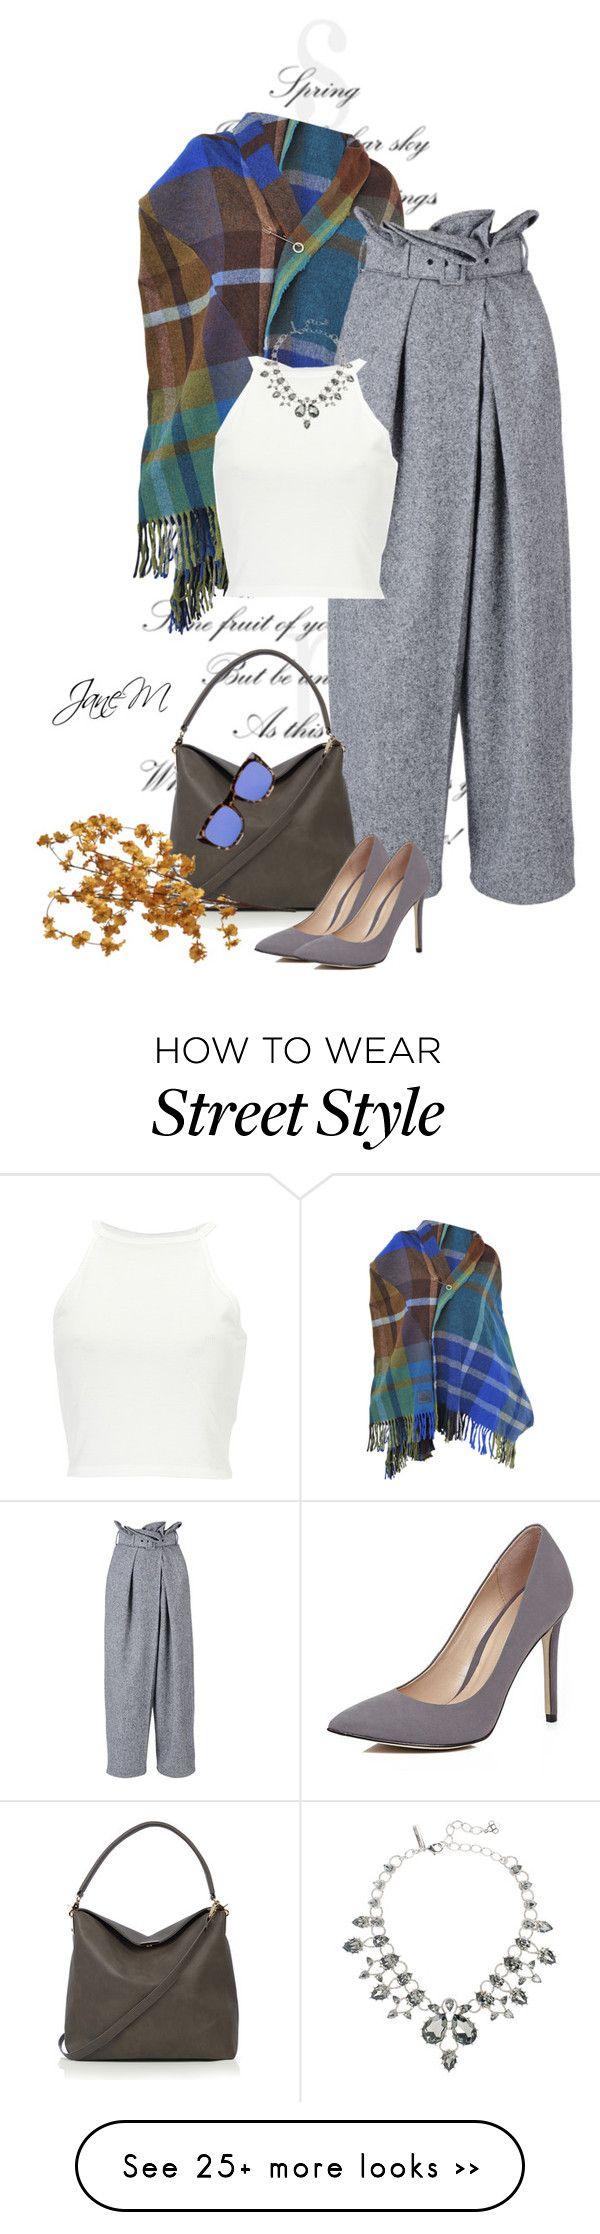 """Street style"" by janemichaud-ipod on Polyvore featuring moda, Vivienne Westwood, STELLA McCARTNEY, Oasis, River Island, Oscar de la Renta, Le Specs y Pier 1 Imports"